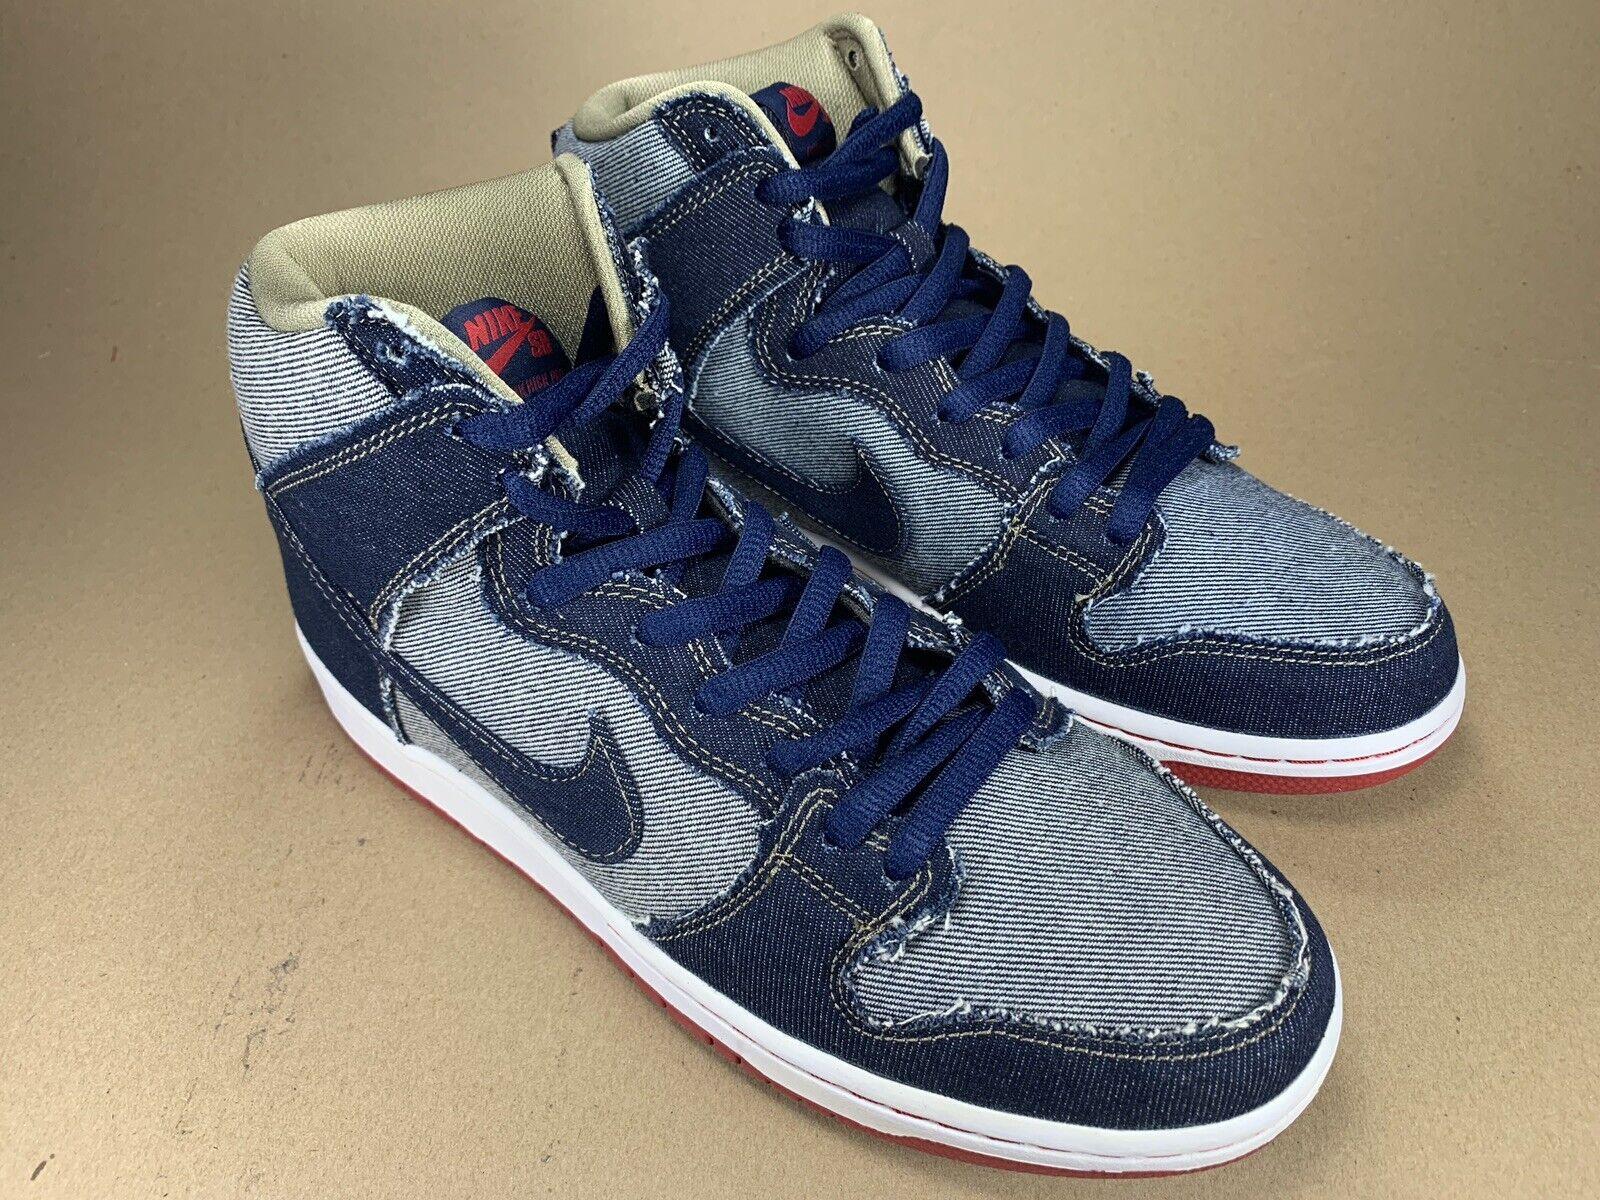 Nike SB Dunk High TRD QS Reese Forbes Dark bluee Denim Red 881758 441 Size 10.5